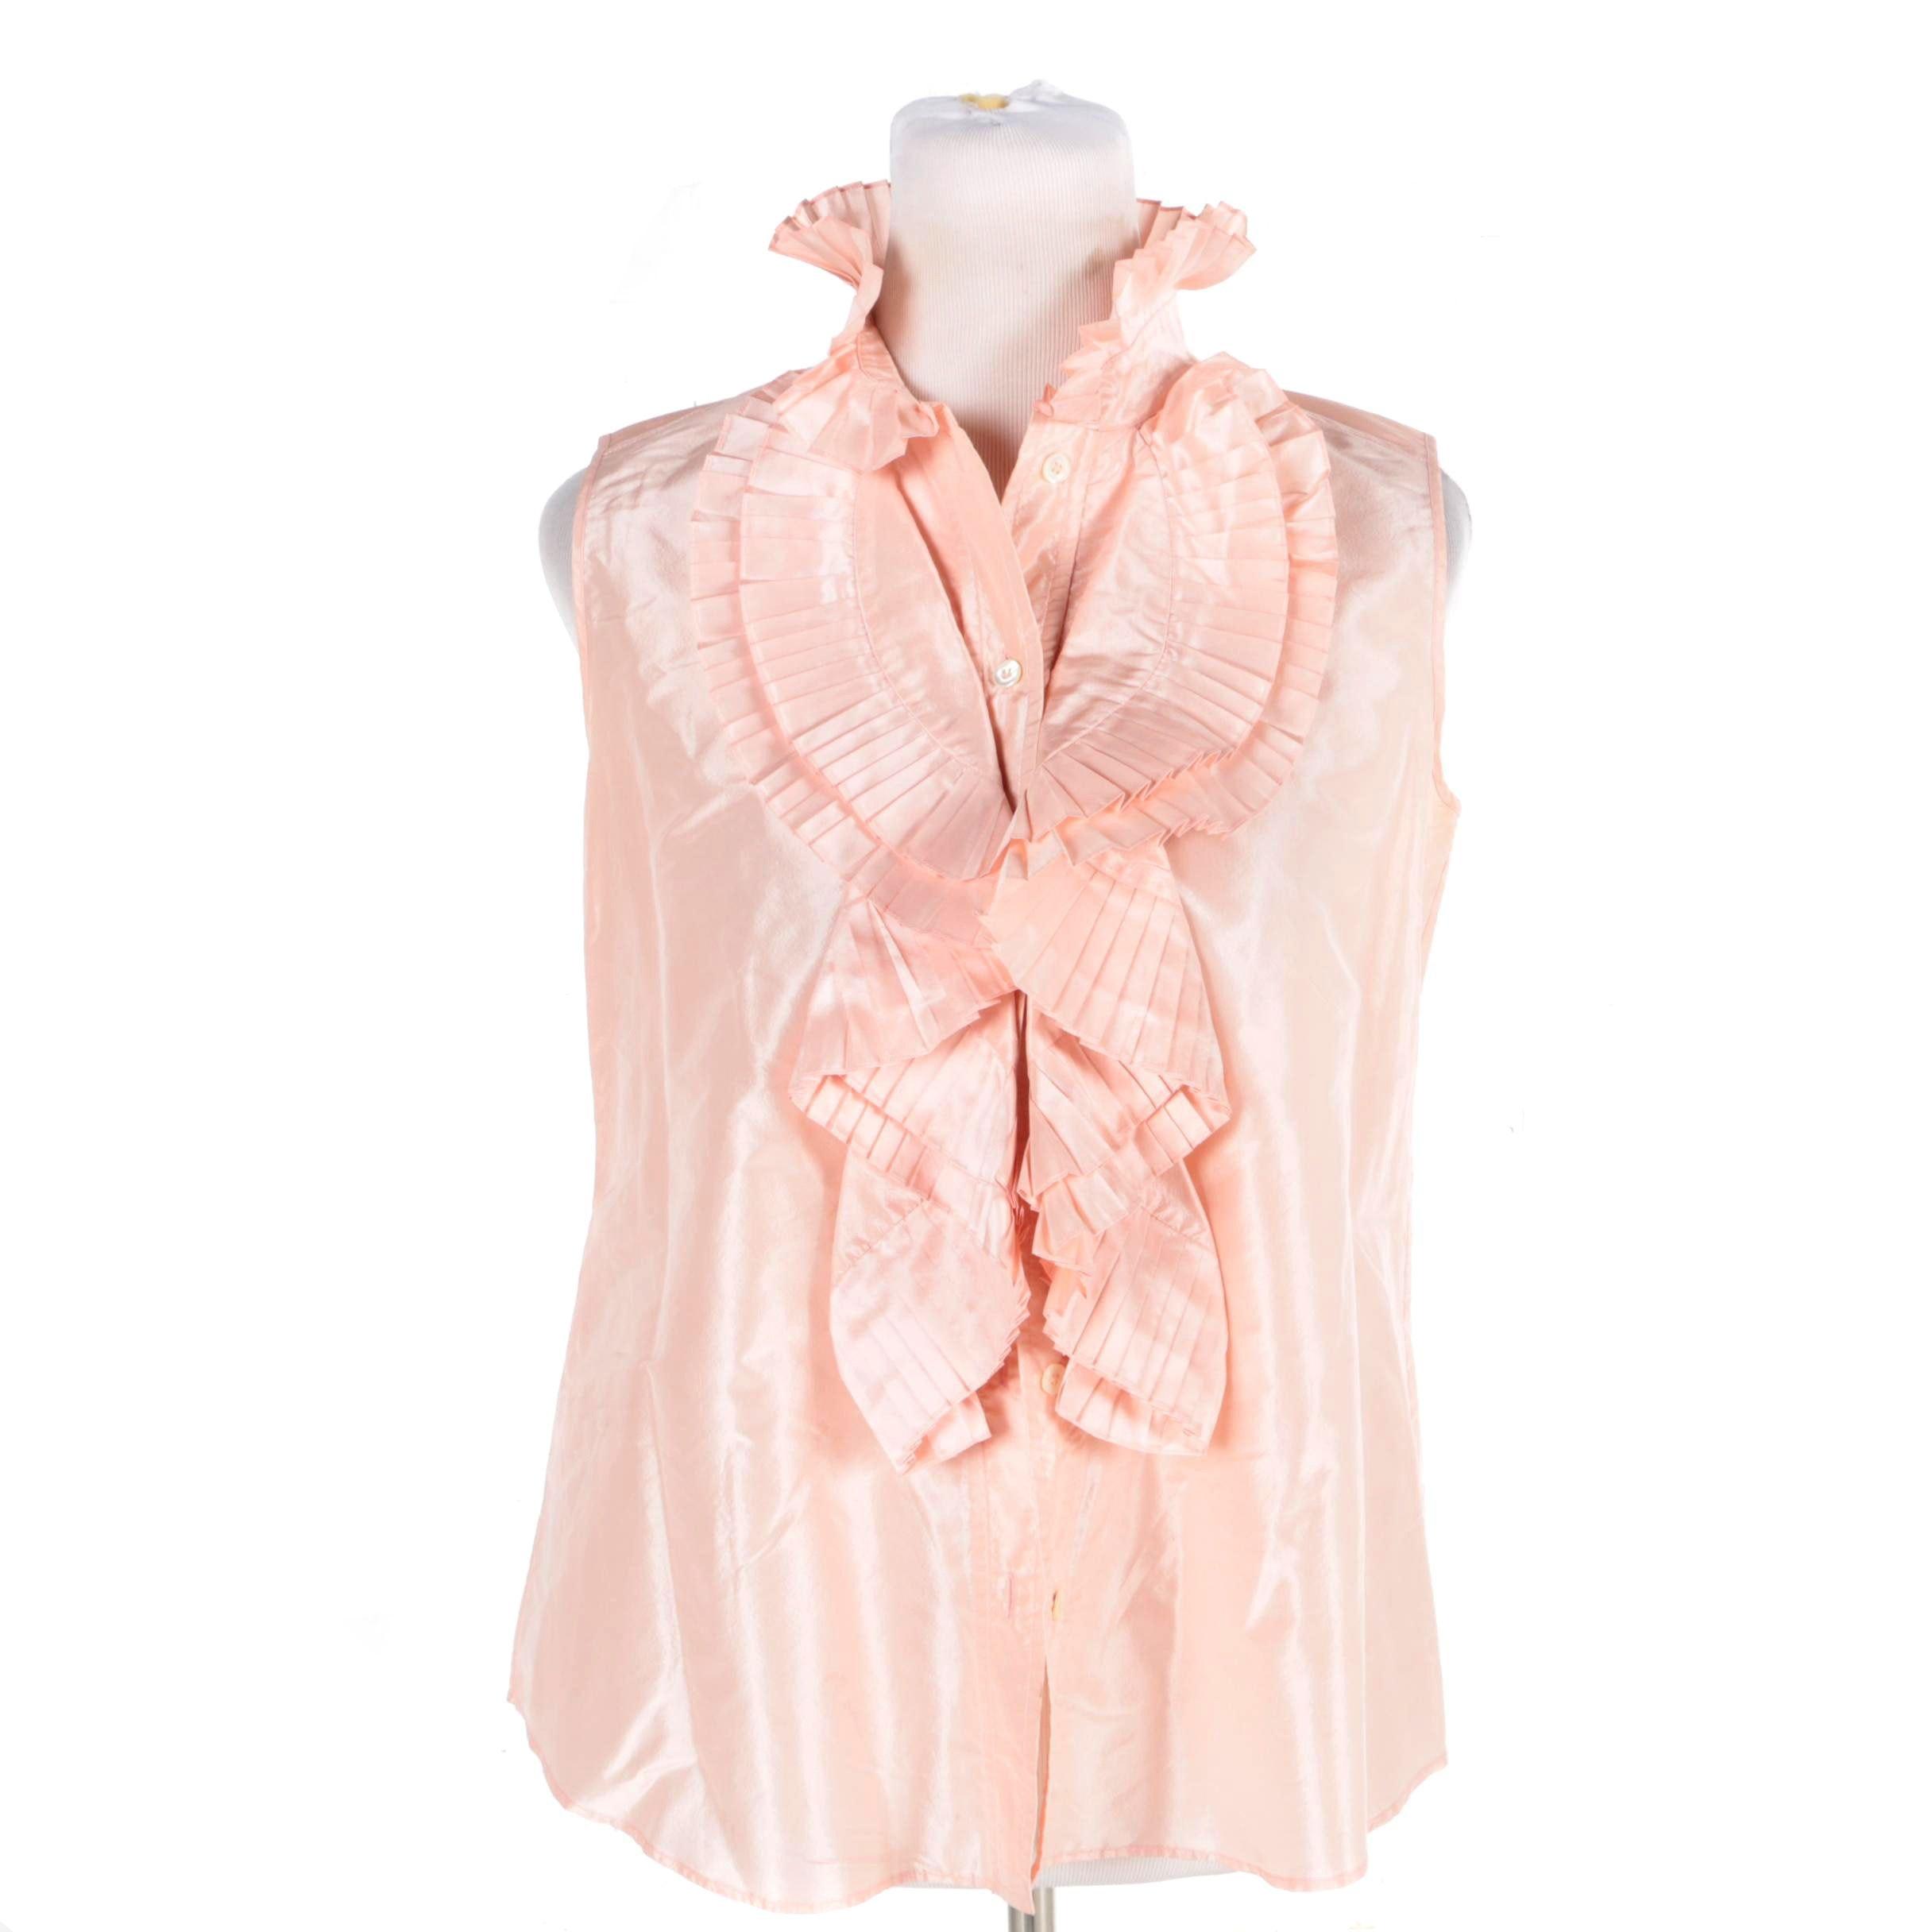 Oscar de la Renta Pink Silk Ruffle Sleeveless Blouse